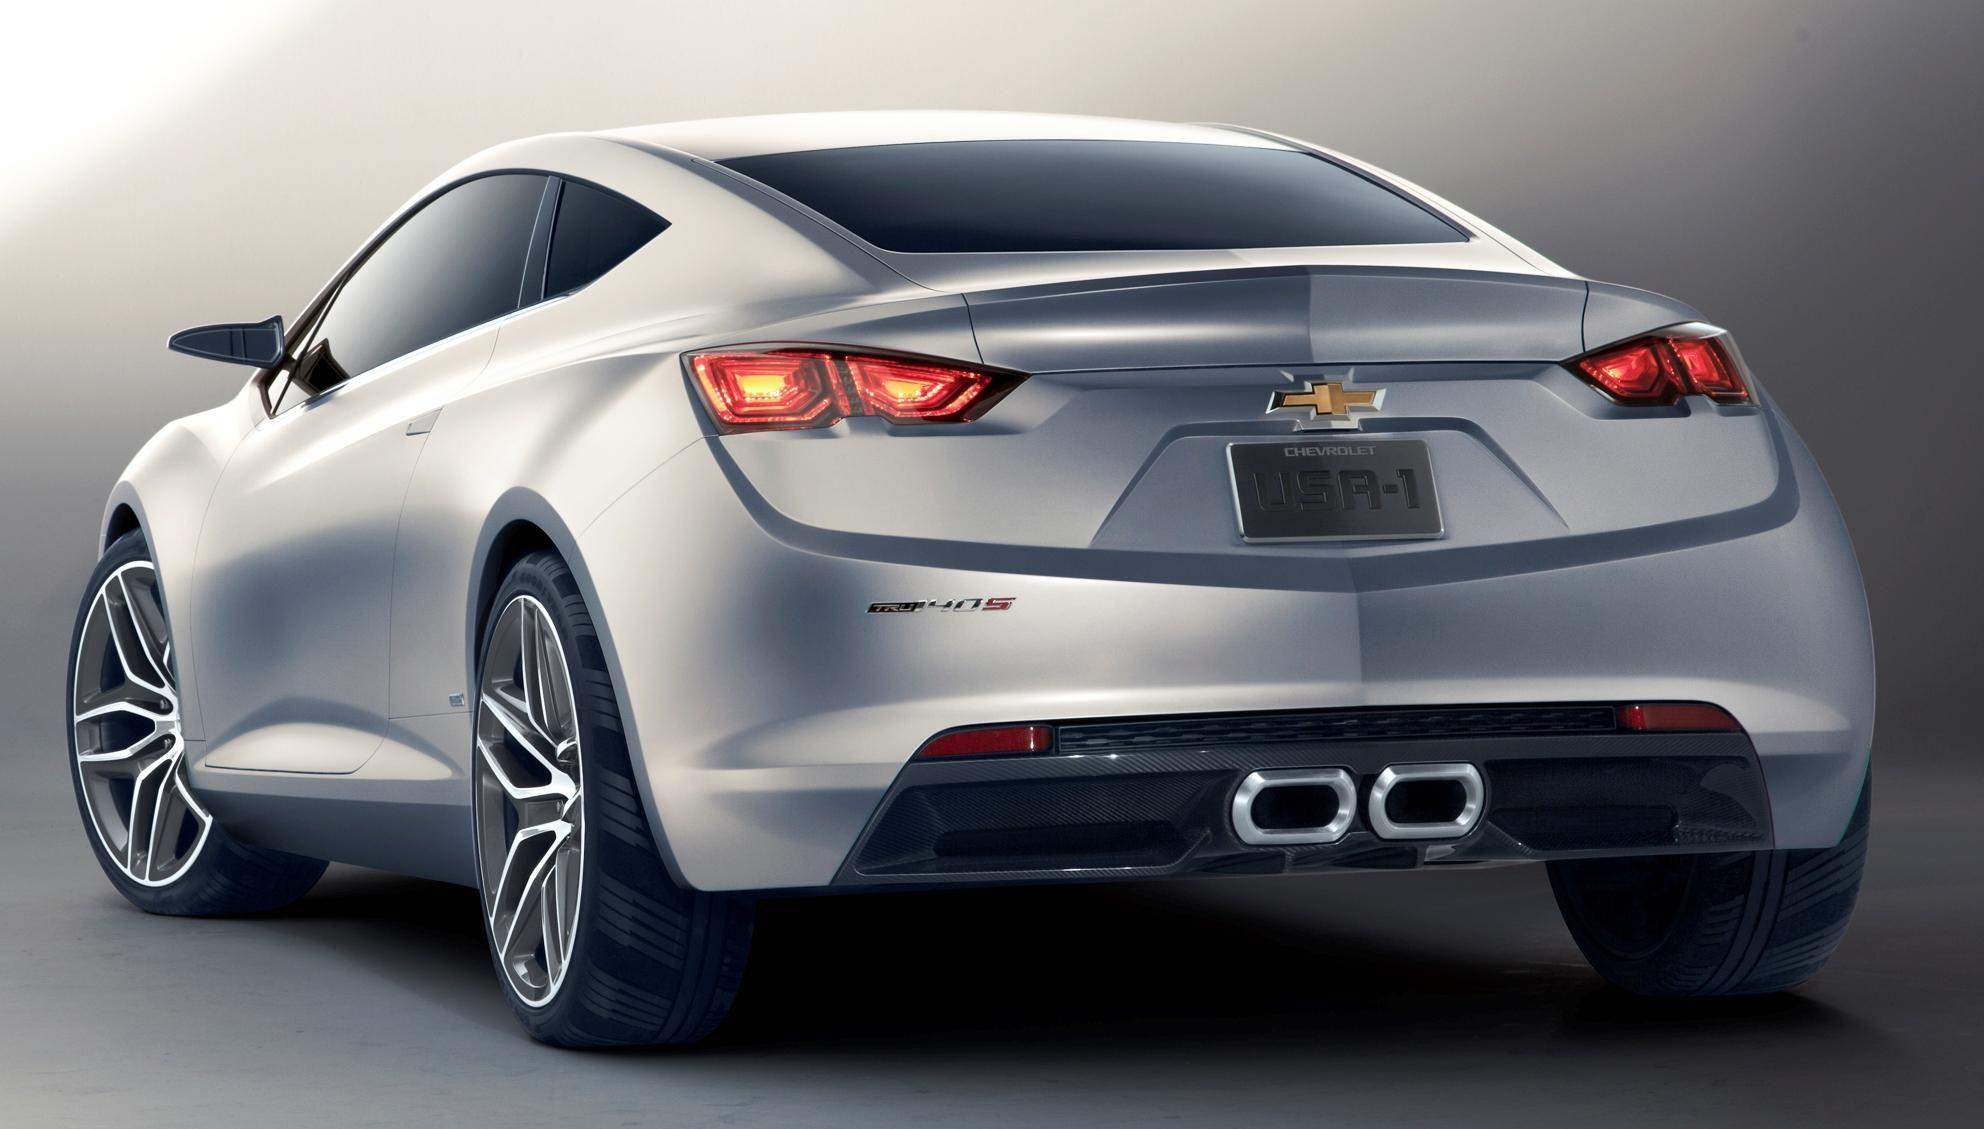 Chevy Concept Cars Wallpaper HD Images - http://hdcarwallfx.com ...